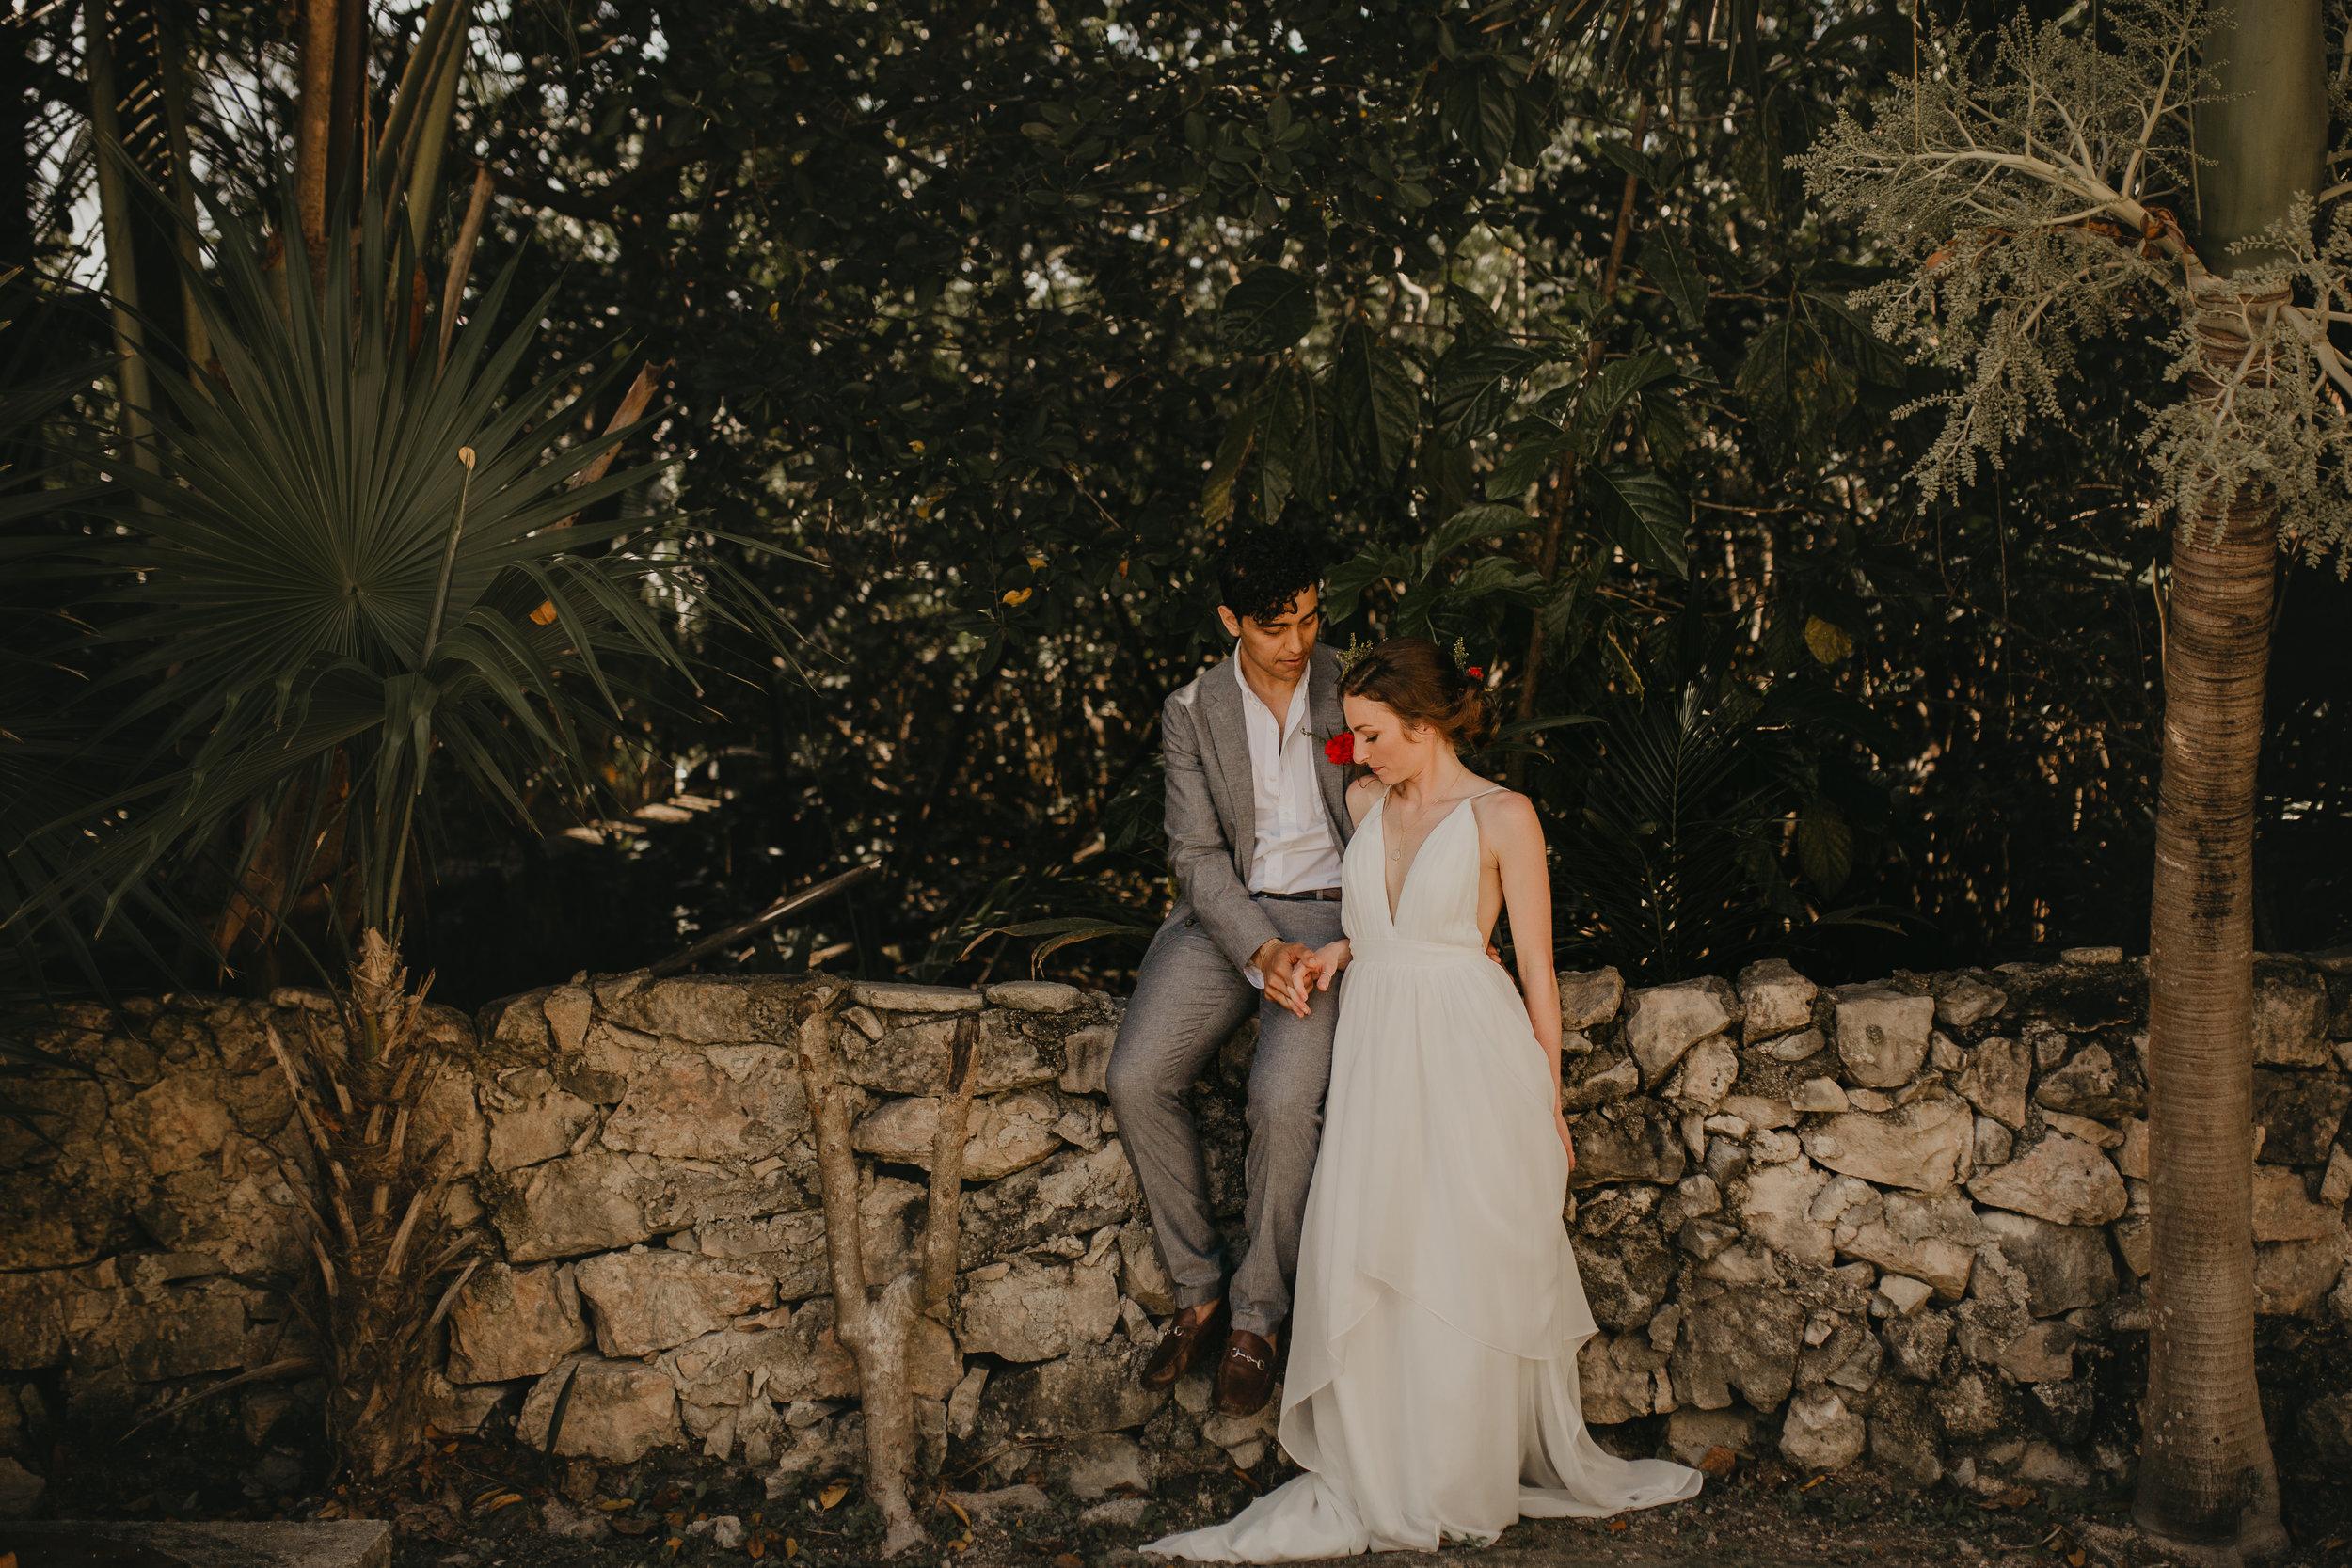 Nicole-Daacke-Photography-beachfront-akumal-destionation-wedding-tulum-mexico-elopement-photographer-destination-wedding-inspiration-sunset-champagne-pop-boho-bride-ocean-tropical-bohemian-tulum-wedding-photos-132.jpg